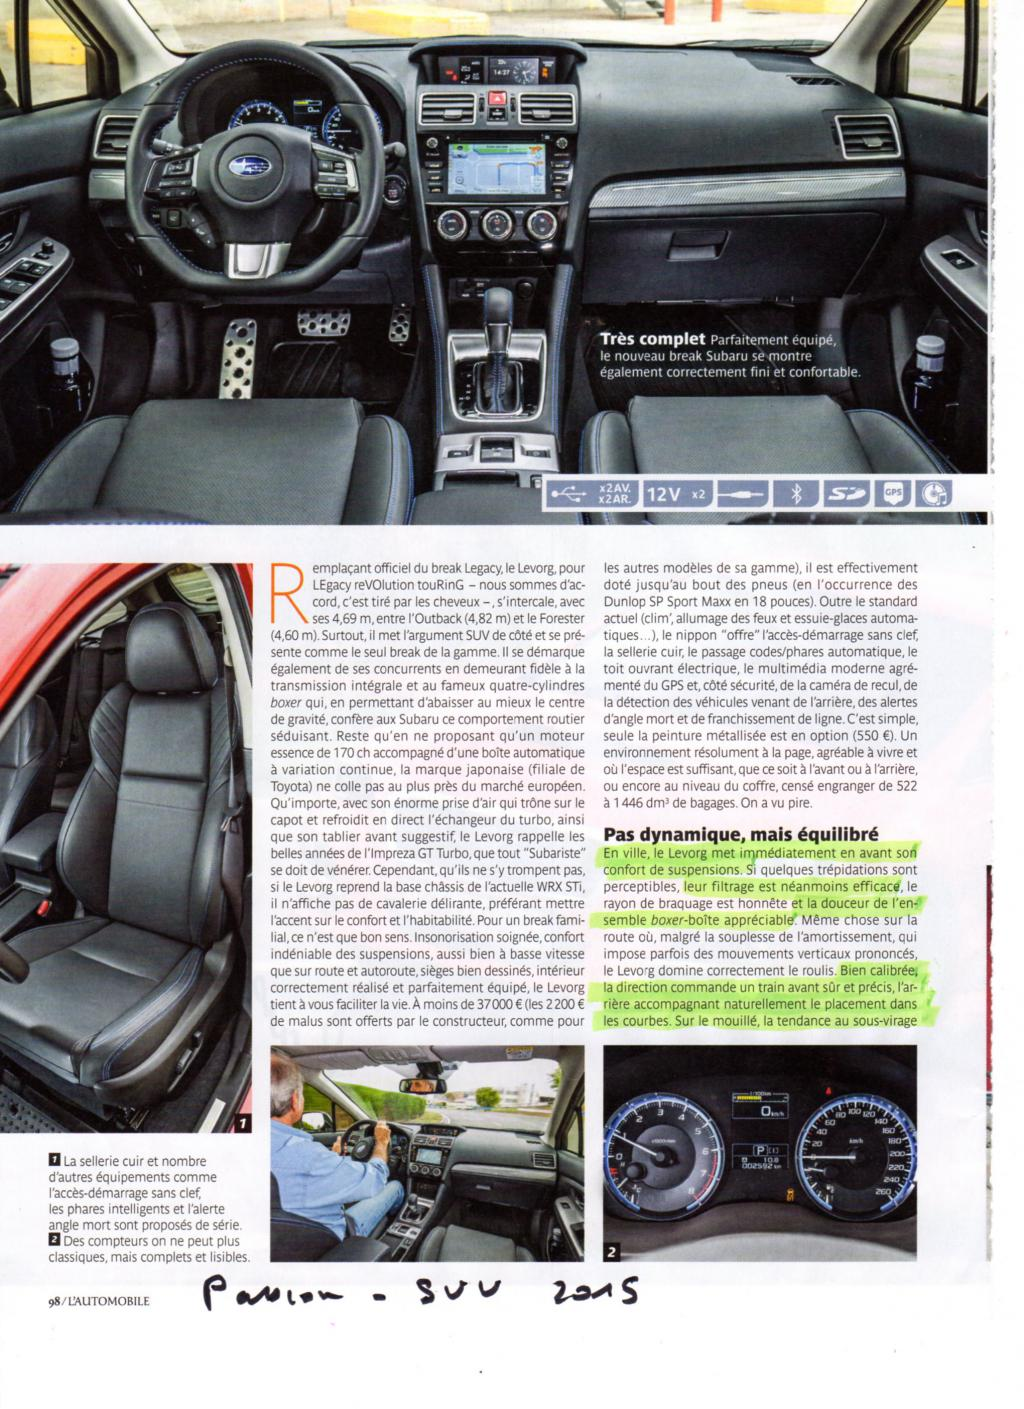 forum subaru diesel test levorg 1 6 gt s lineartronic 170 cvs 2200 euros de malus pseudo. Black Bedroom Furniture Sets. Home Design Ideas